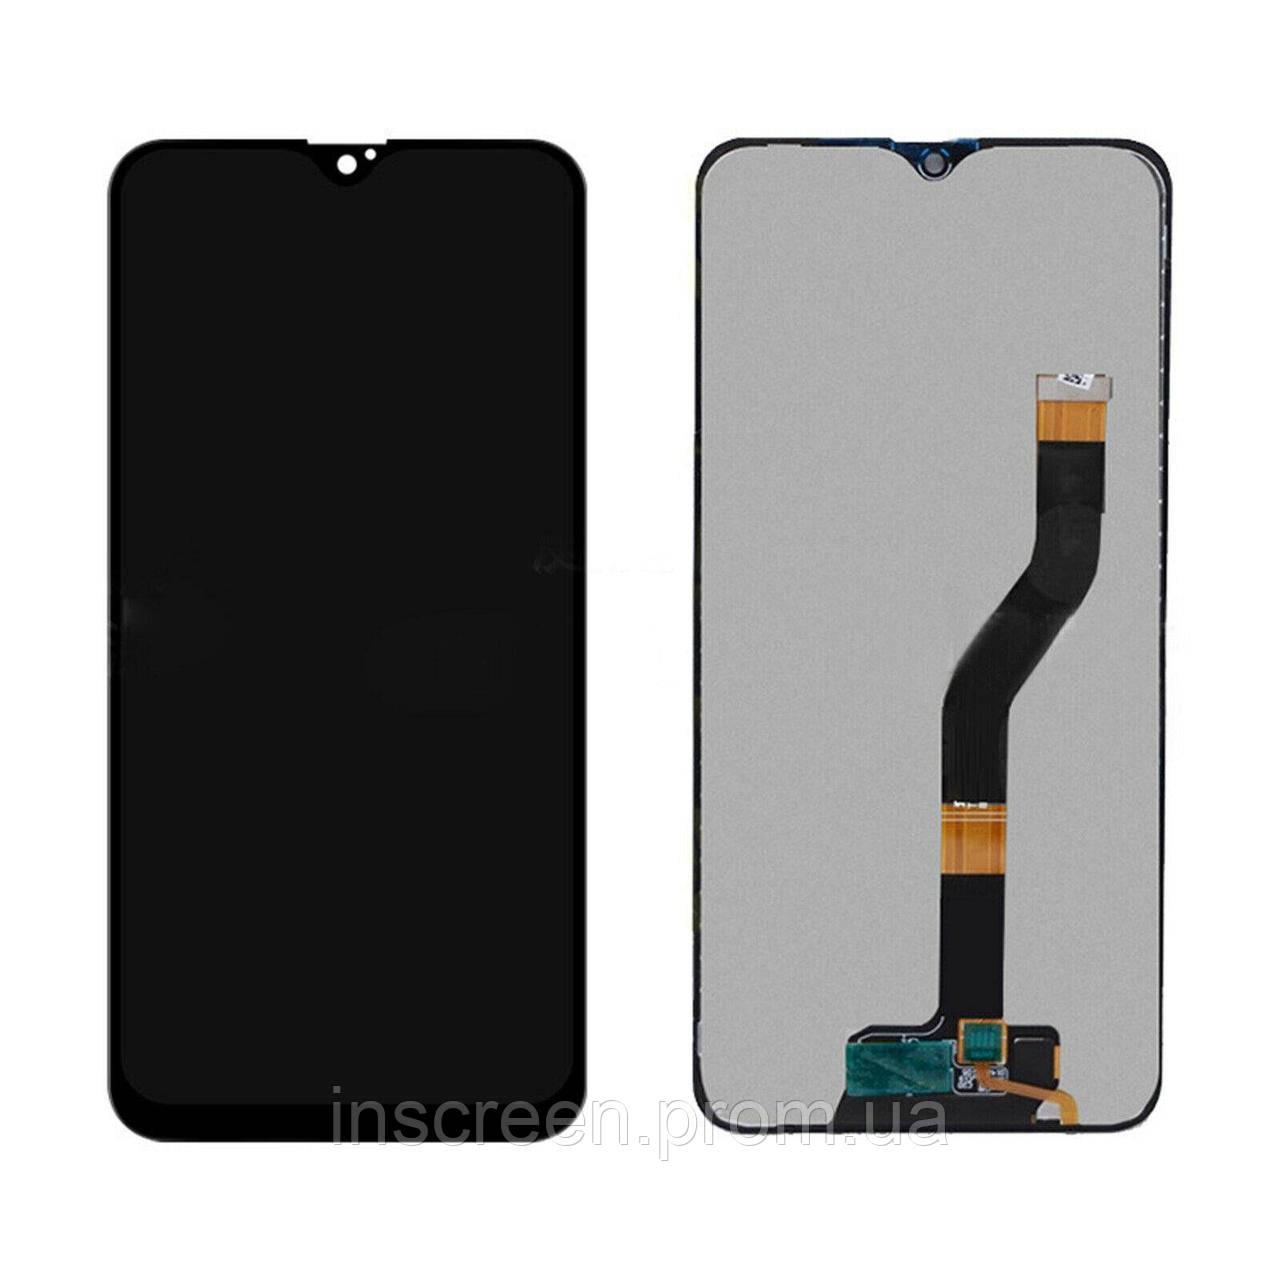 Дисплейний модуль для Samsung A107F Galaxy A10s чорний (GH81-17482A) Оригінал